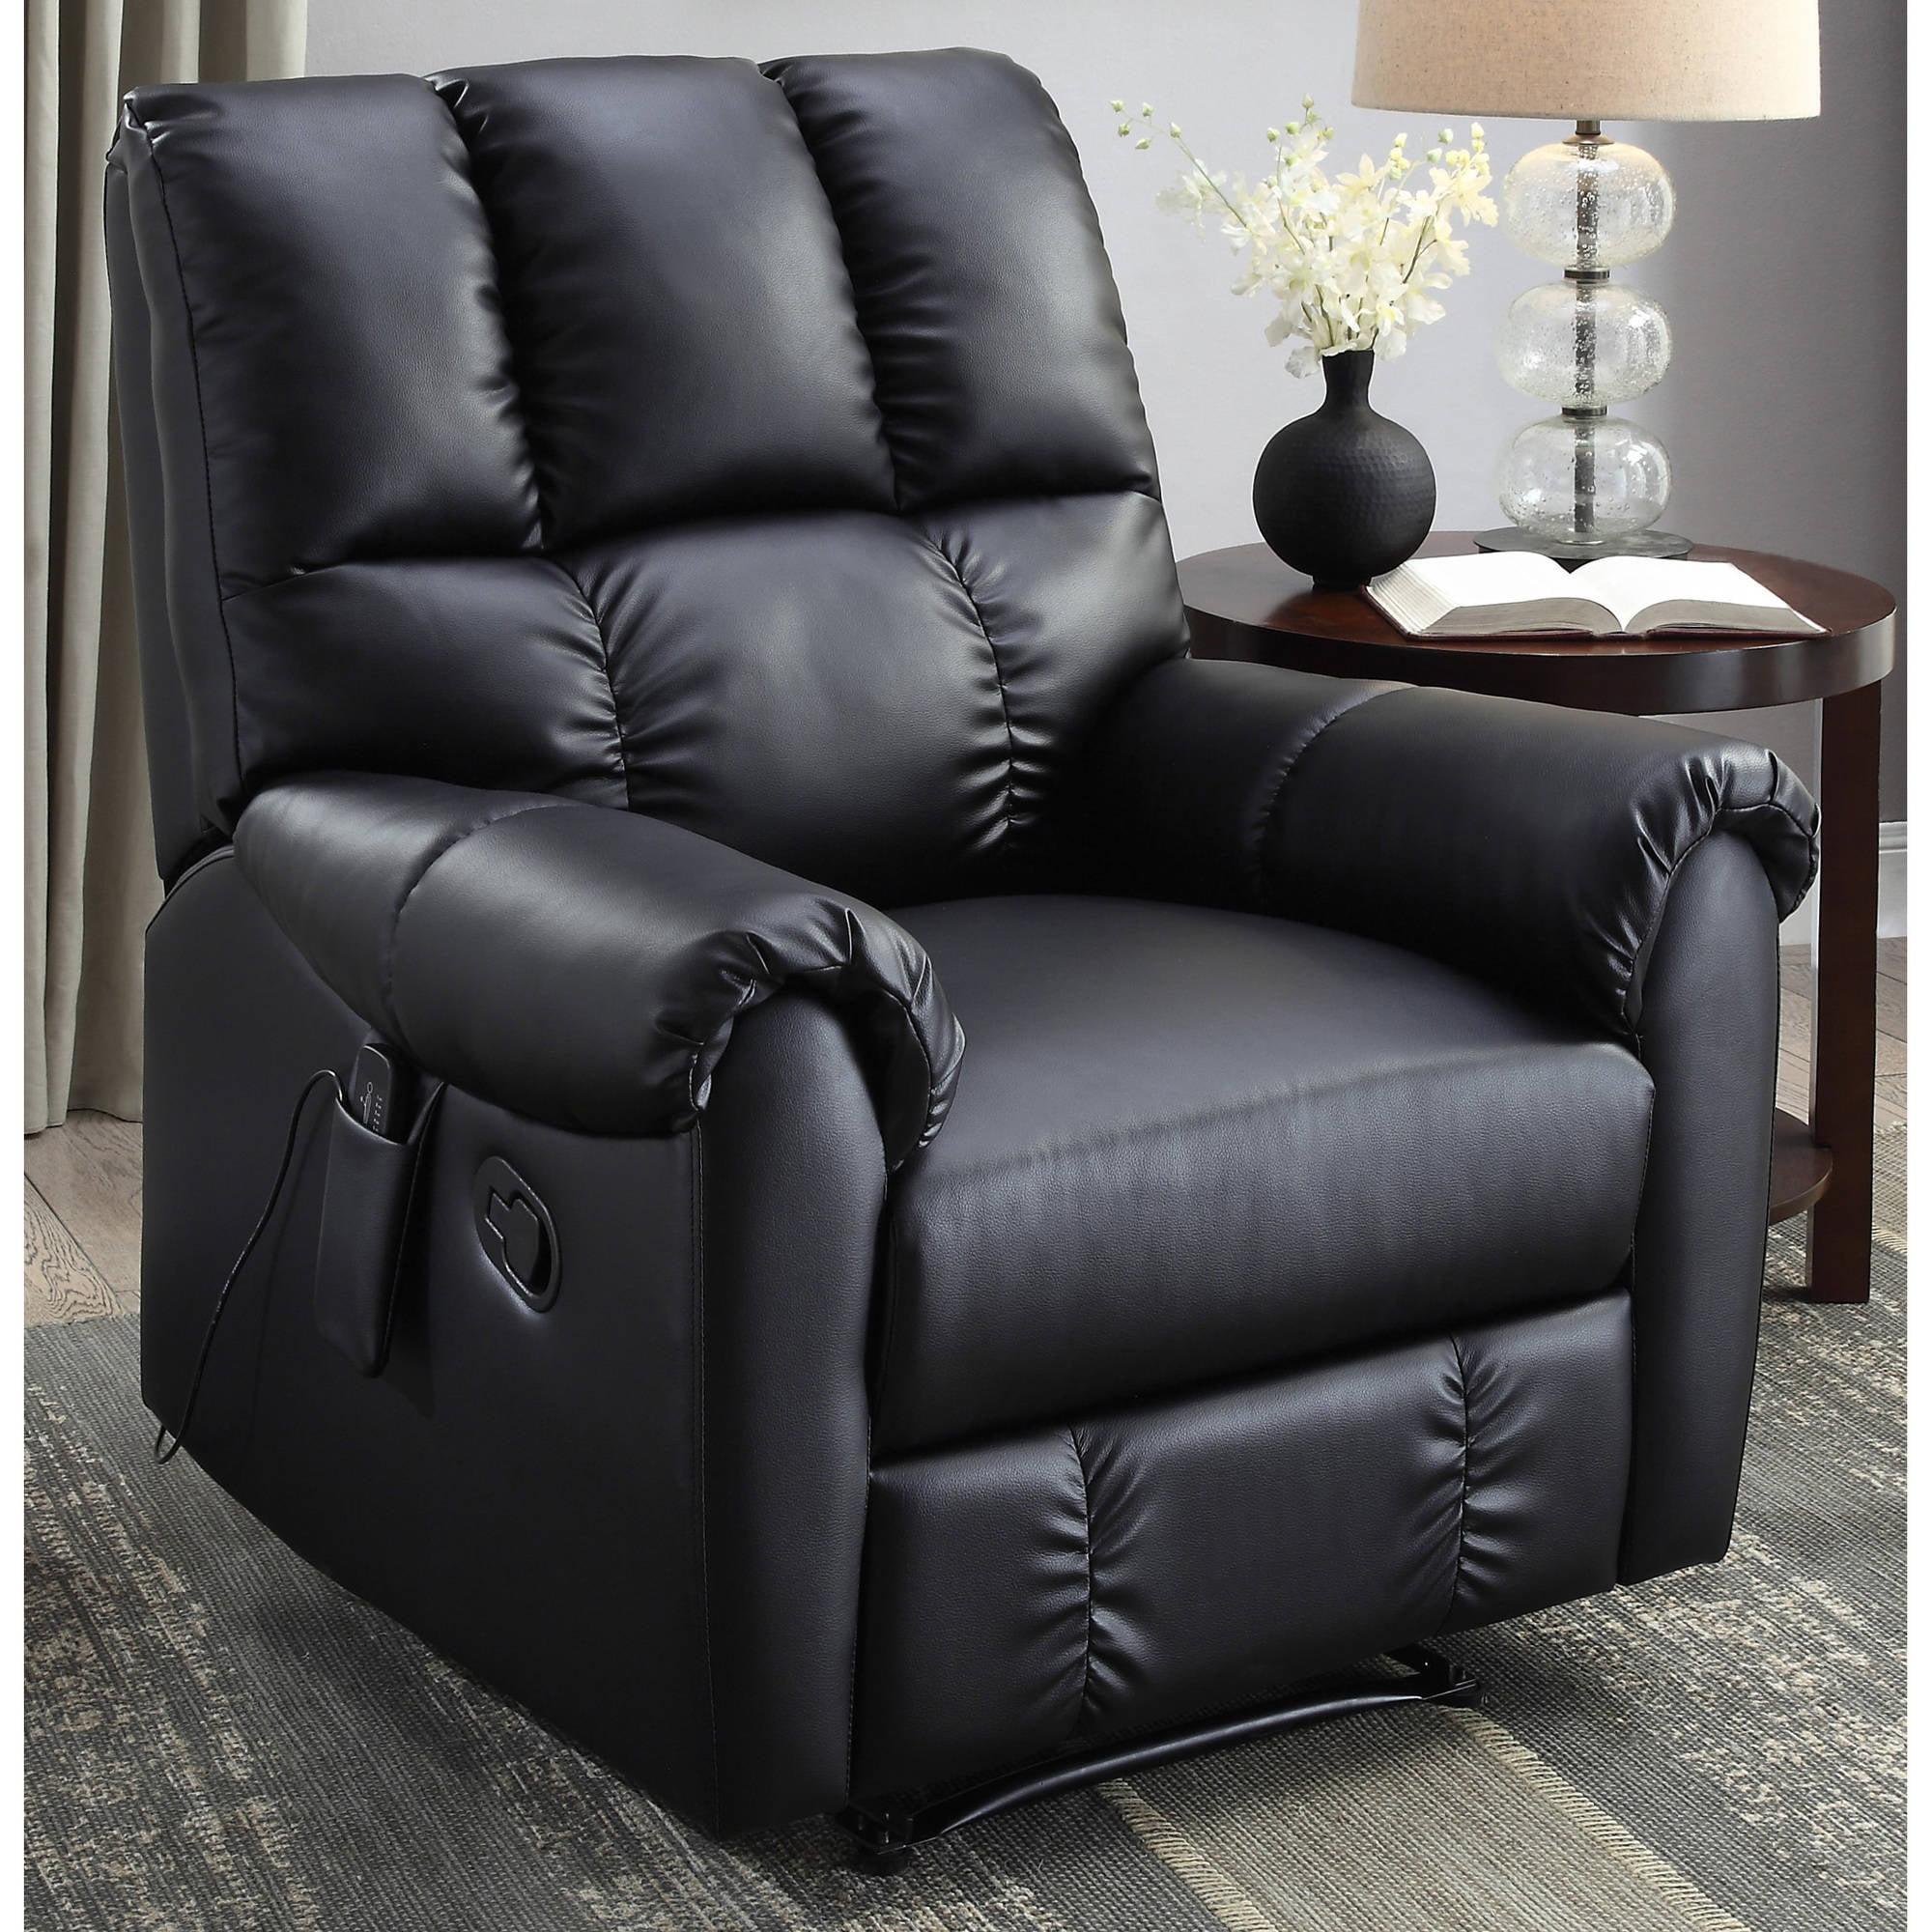 sofa loveseat chair recliner abington serta upholstery and safari products